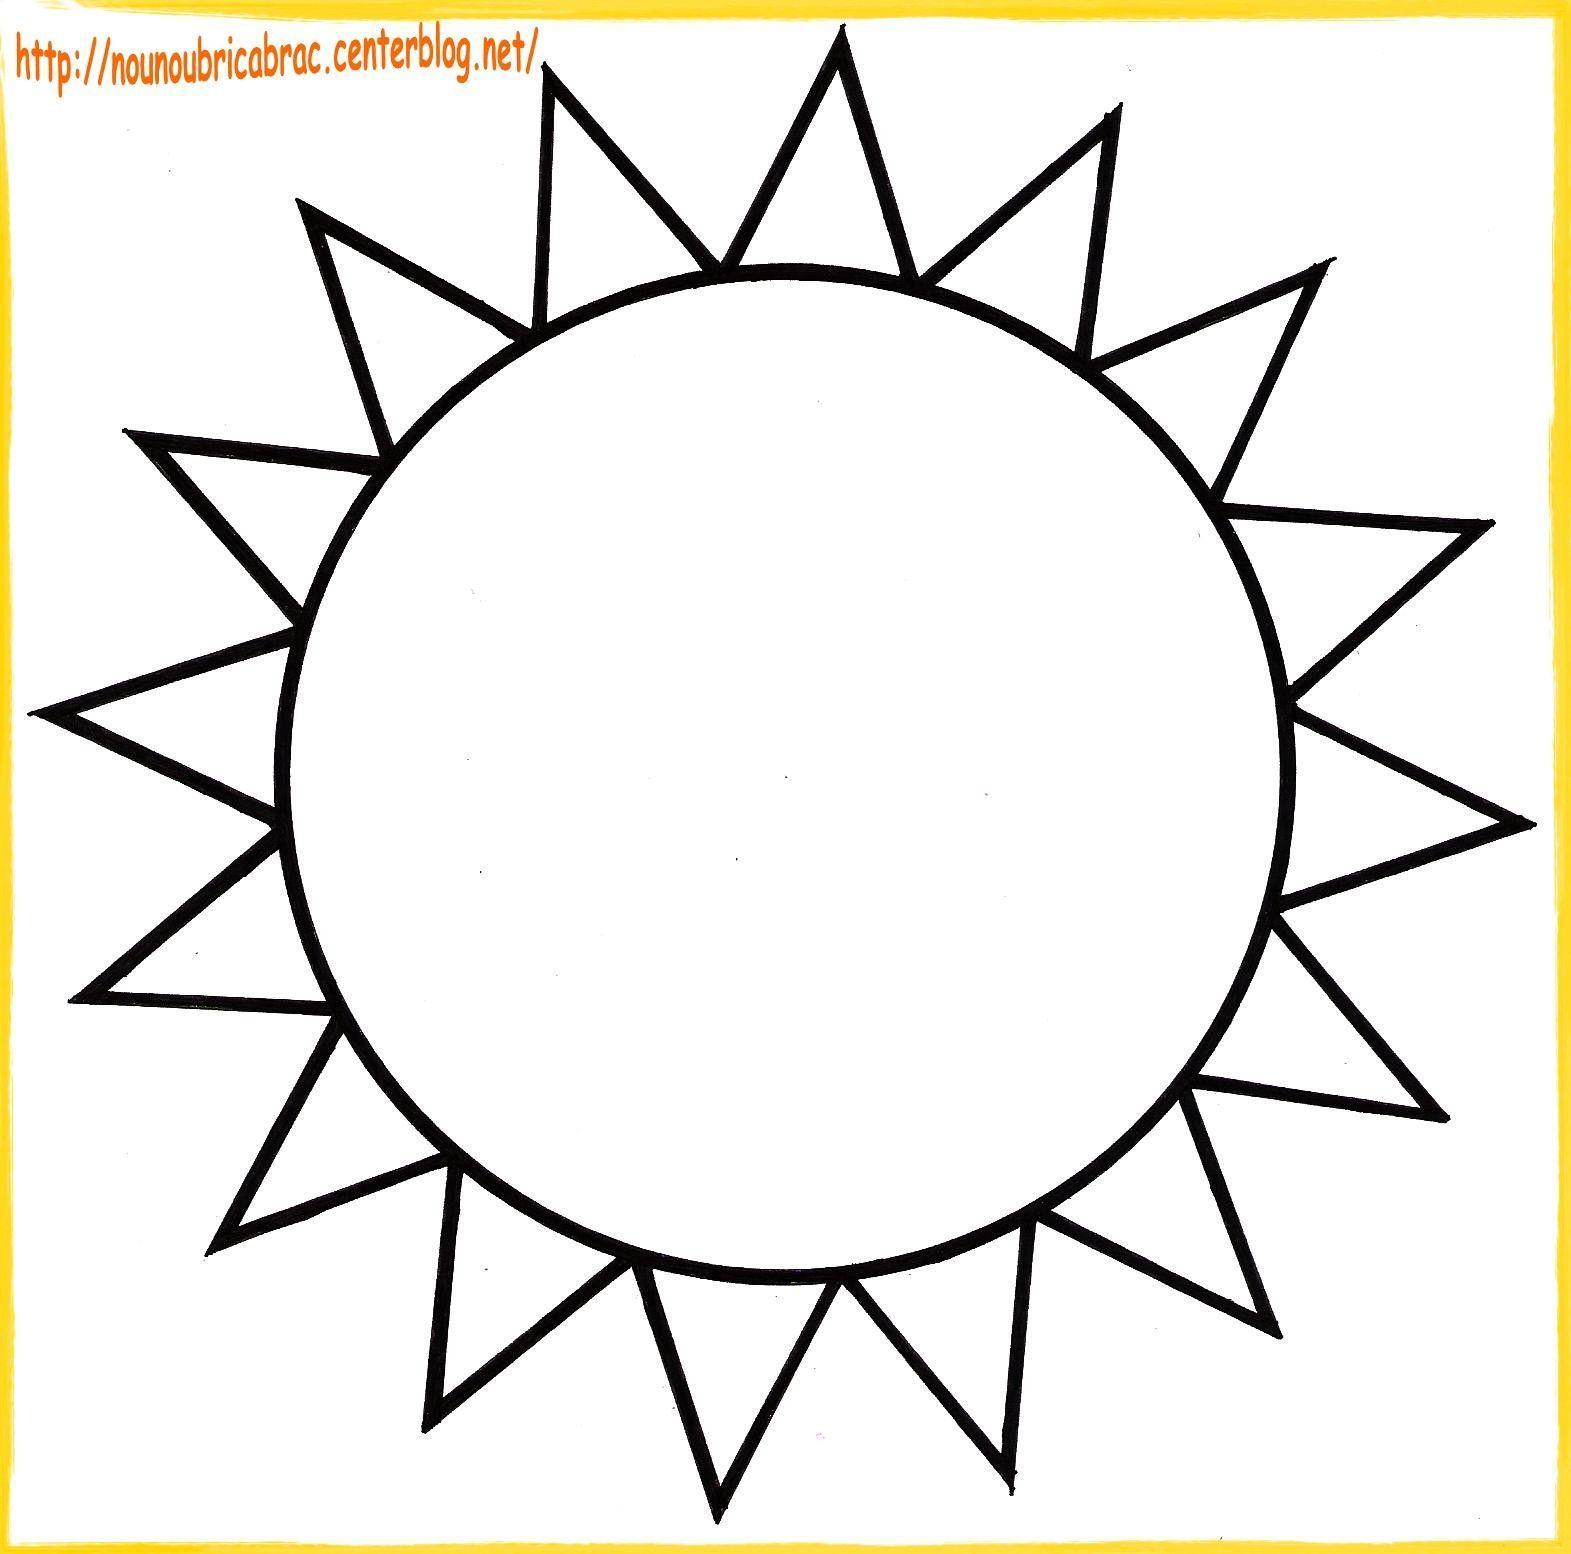 Coloriages meteo - Dessin de soleil a imprimer ...